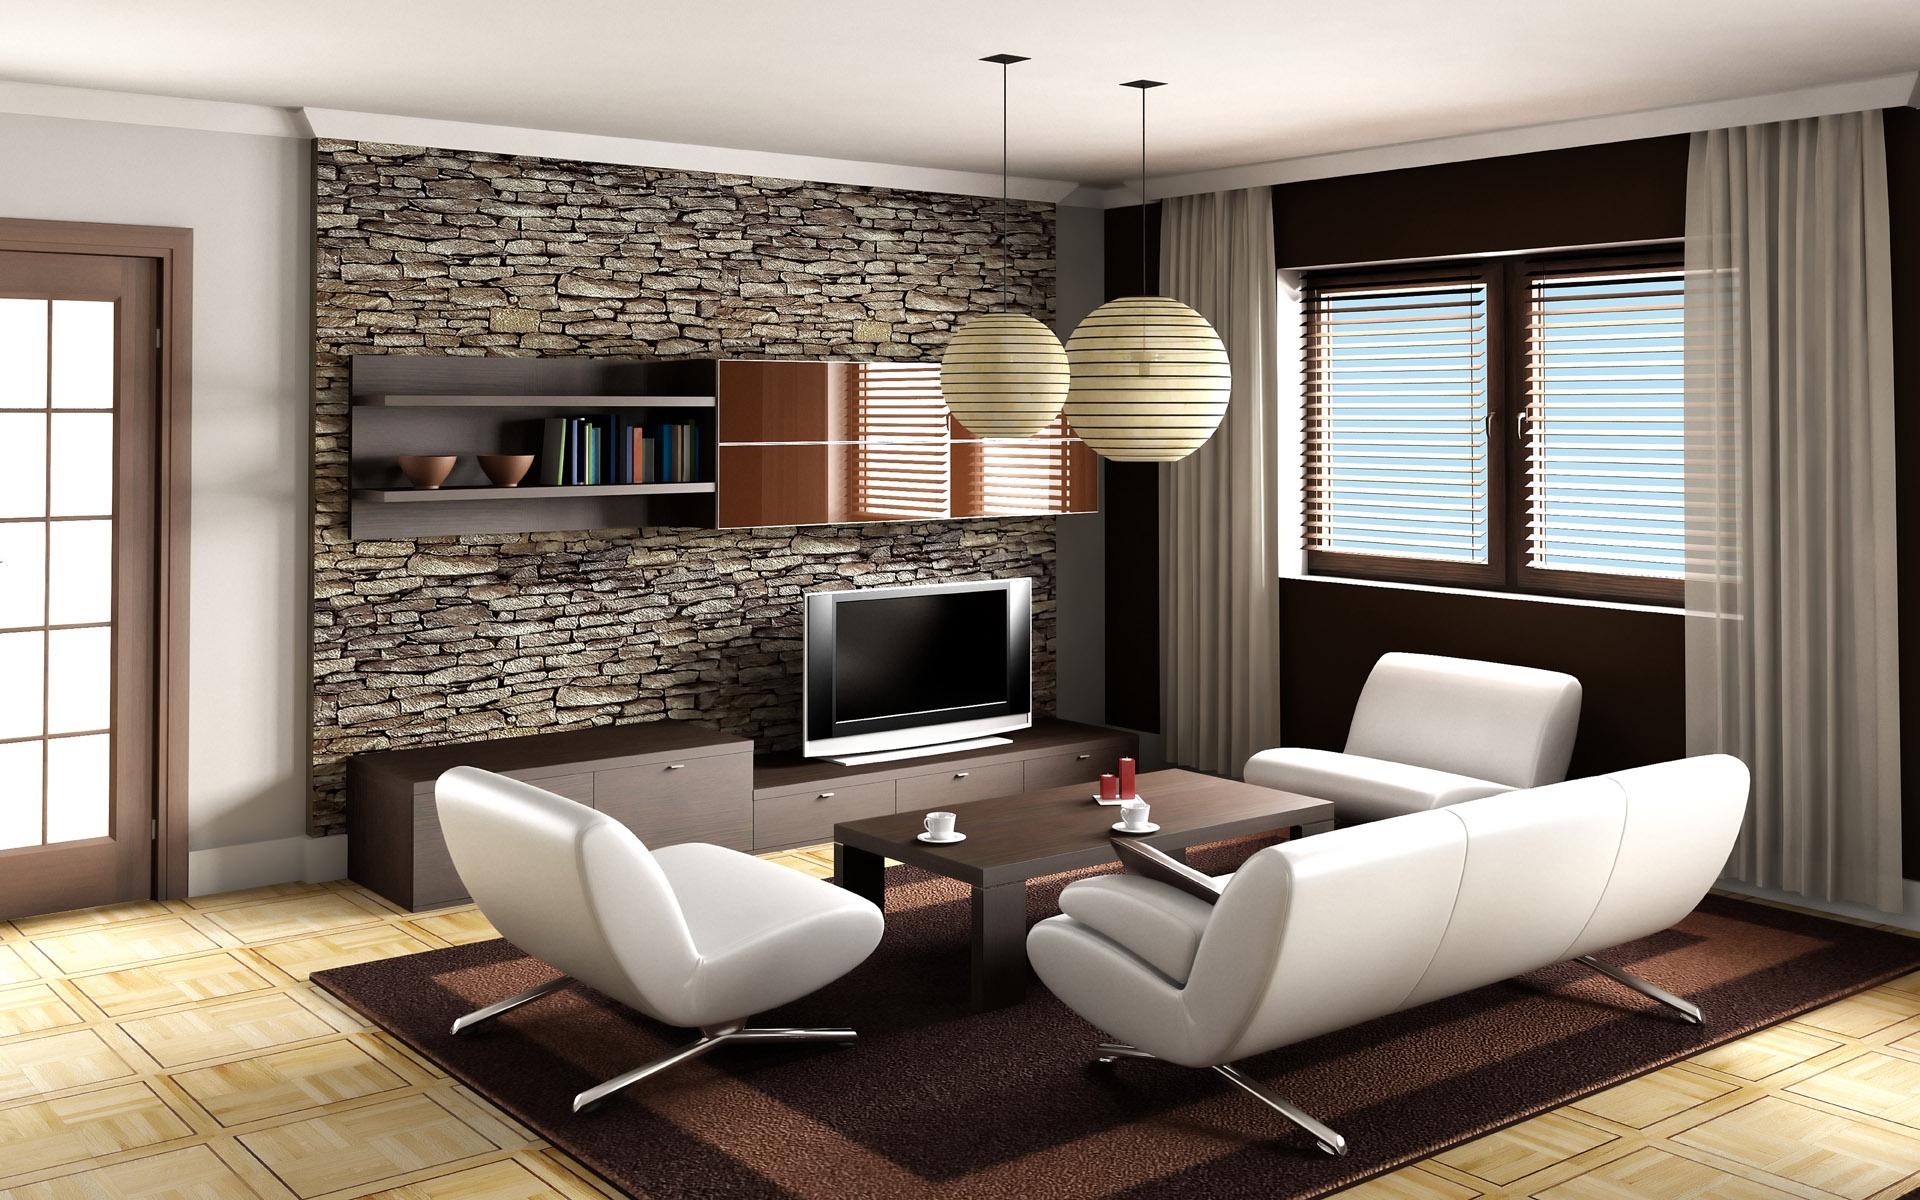 interior home6.jpg